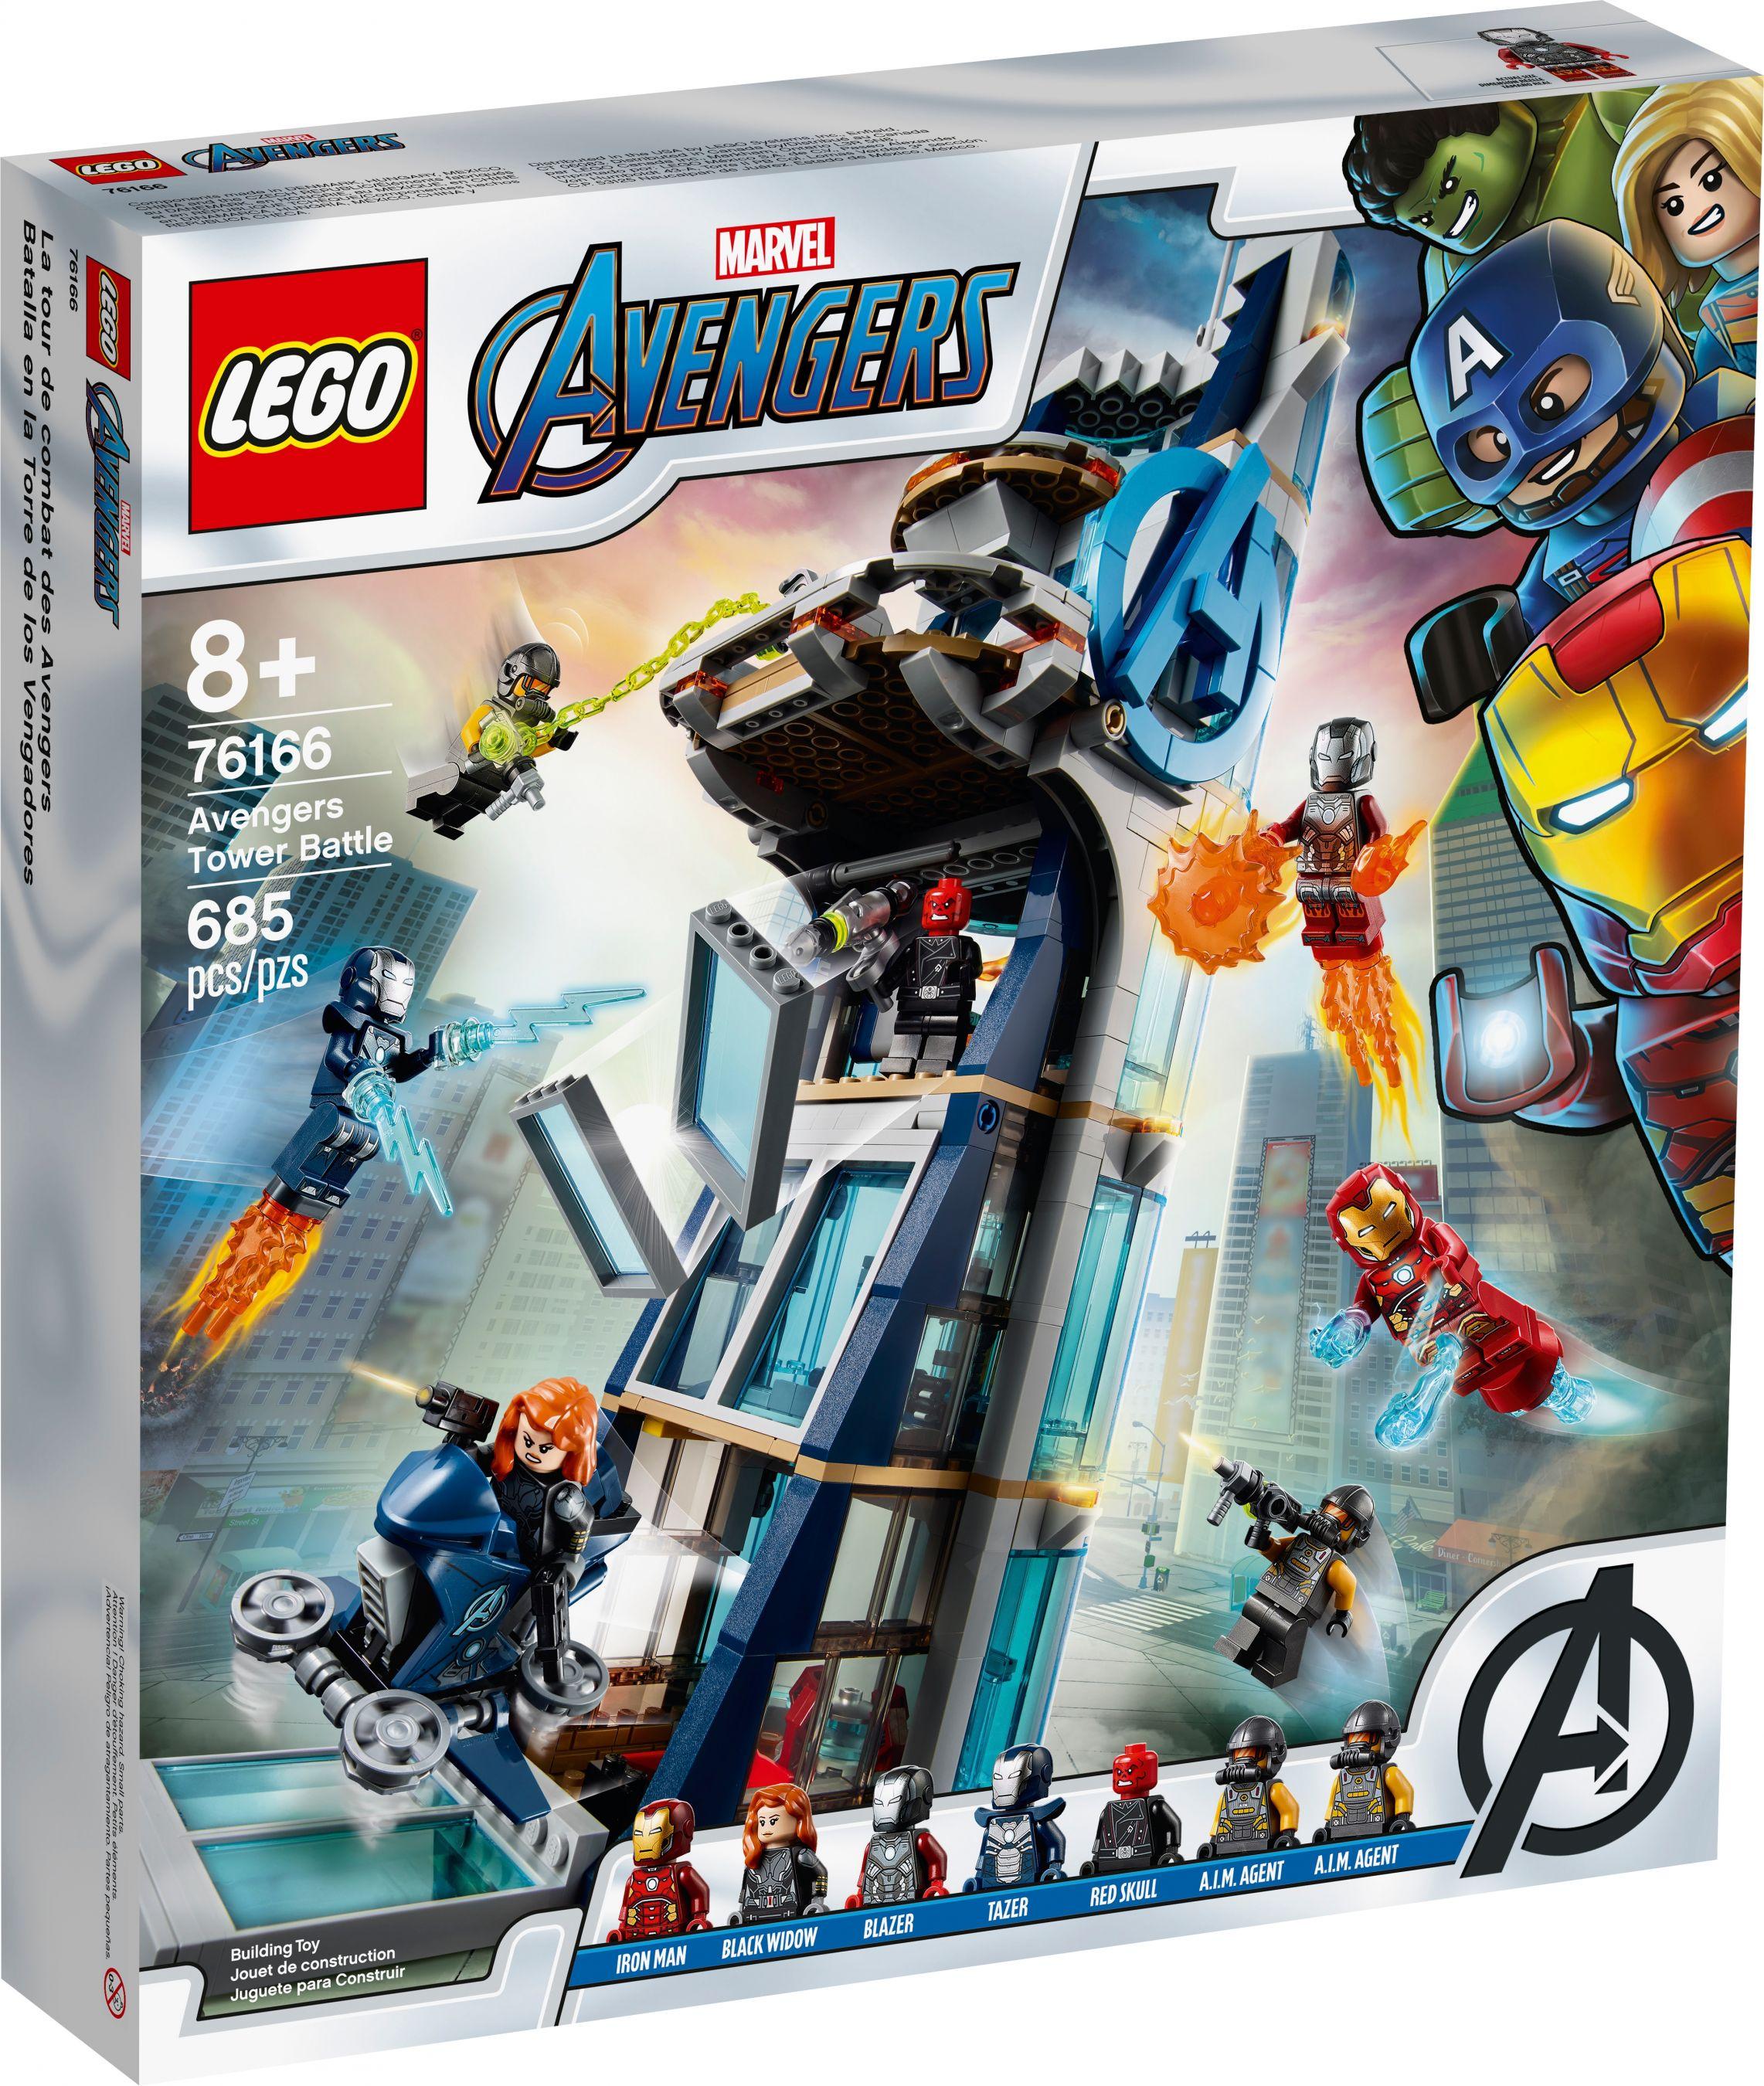 76166 Avengers Tower Battle